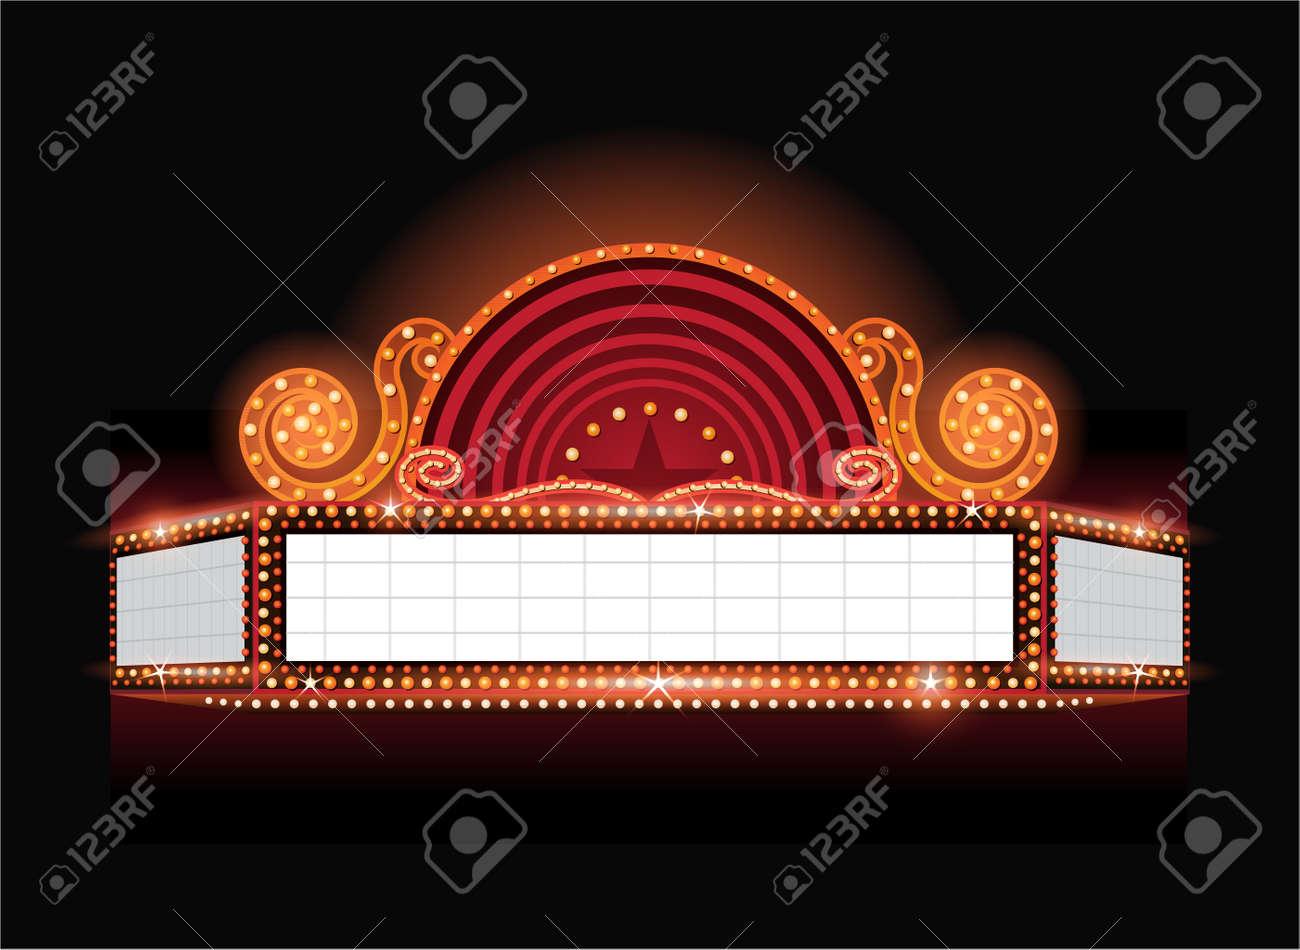 Brightly theater glowing retro cinema neon sign - 53756507